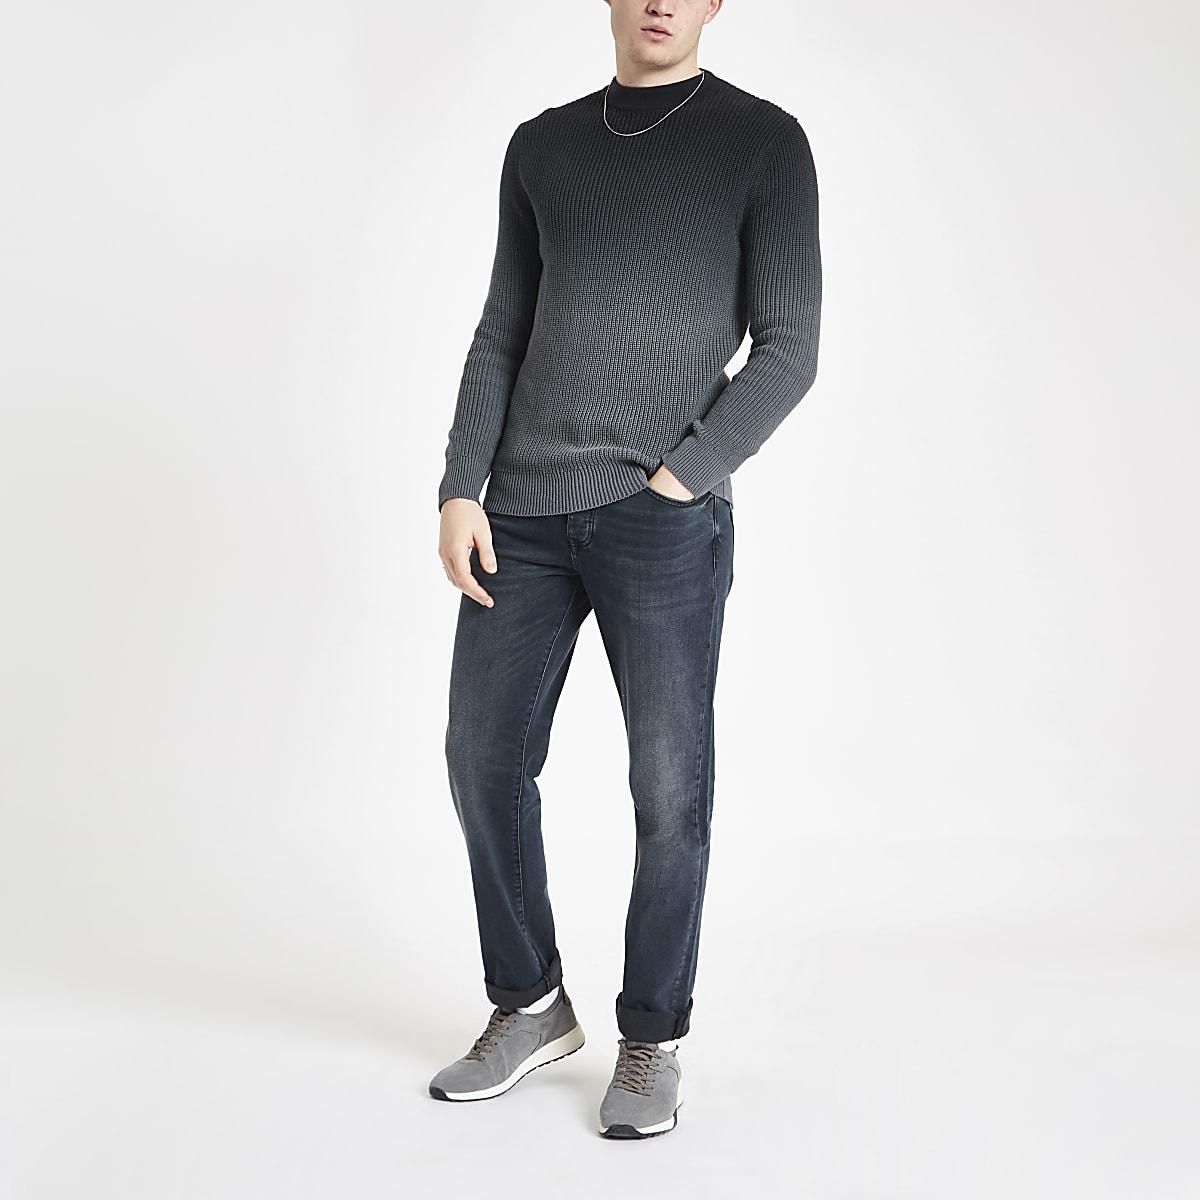 Grey ombre slim fit knit jumper